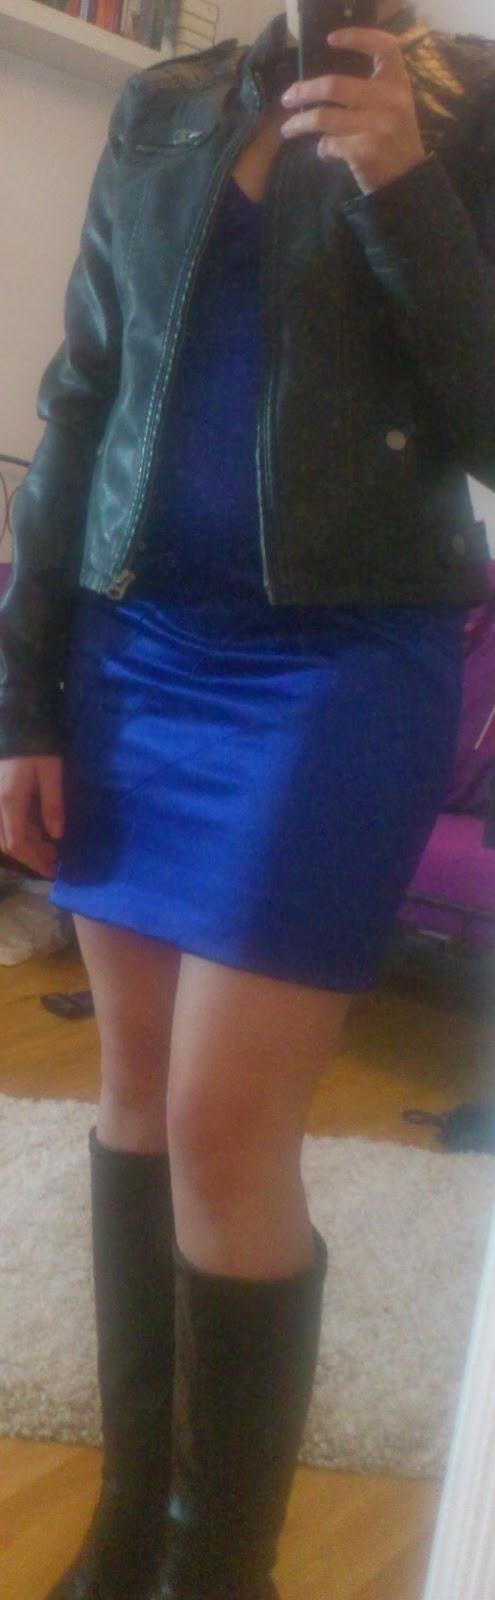 Lucciola Outfit Royalblaues Kleid Und Leder Teil 2